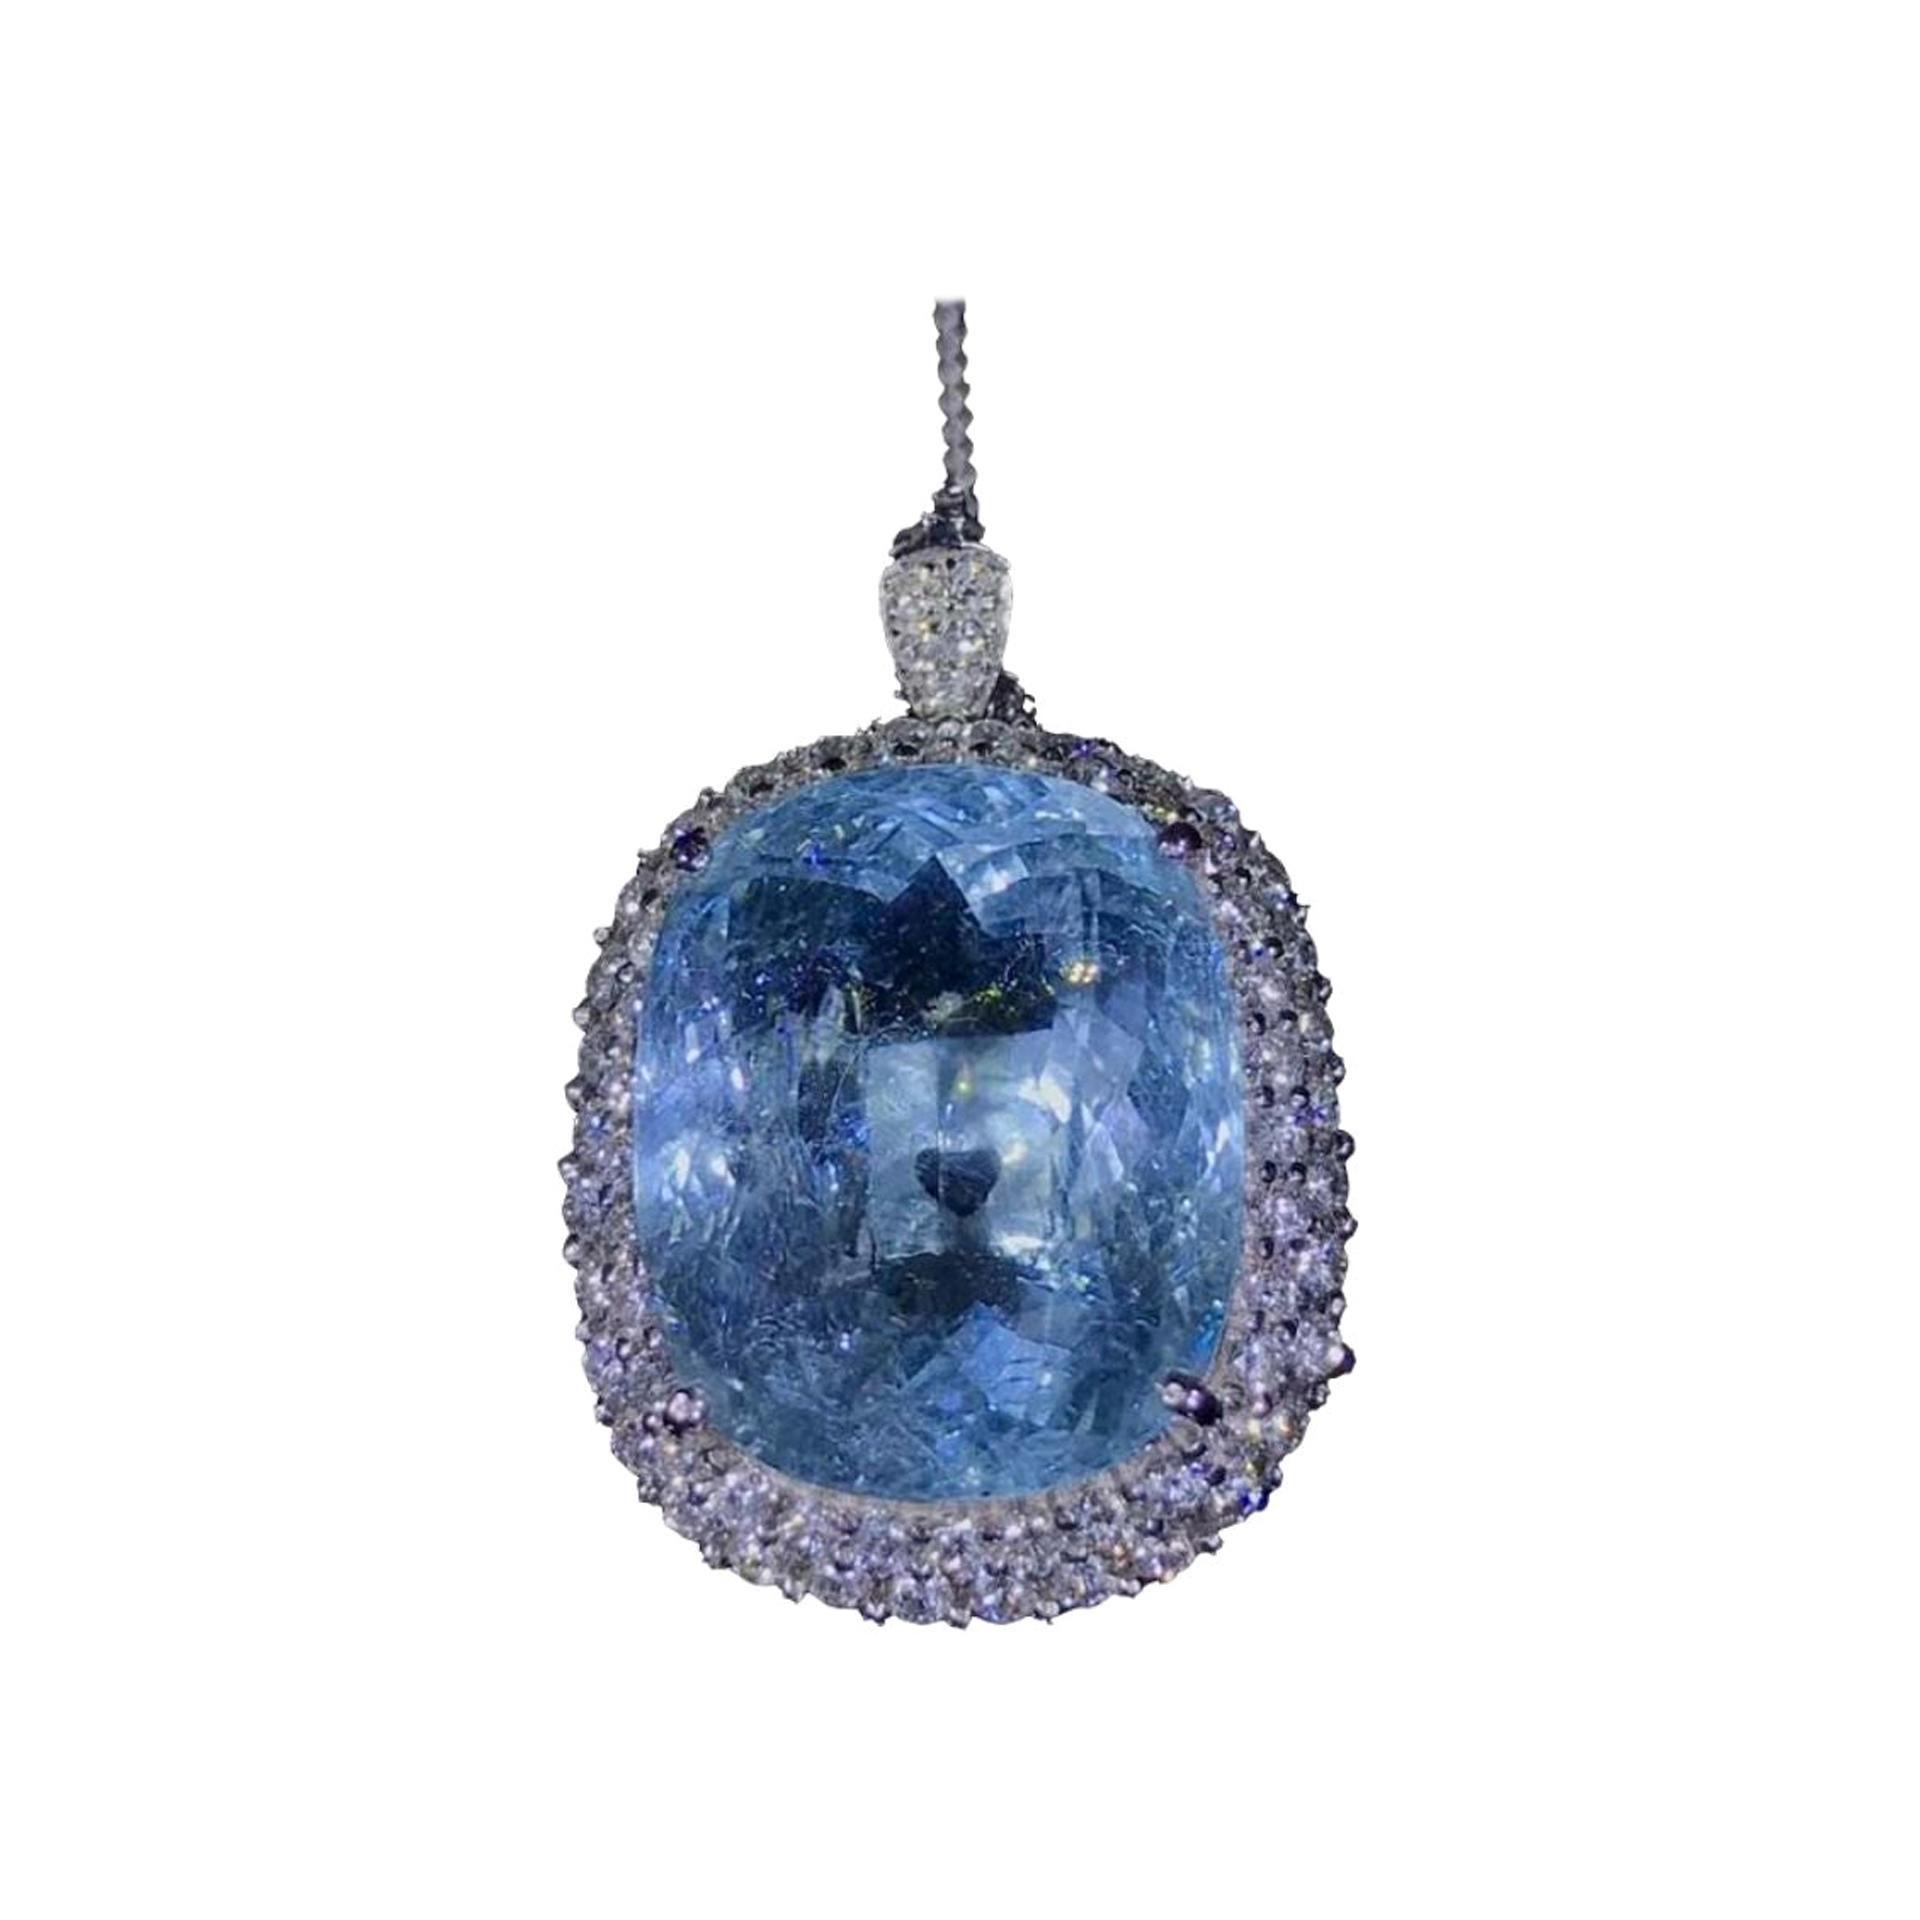 20.15ct Paraiba Tourmaline Diamond Necklace or Ring 18k White Gold